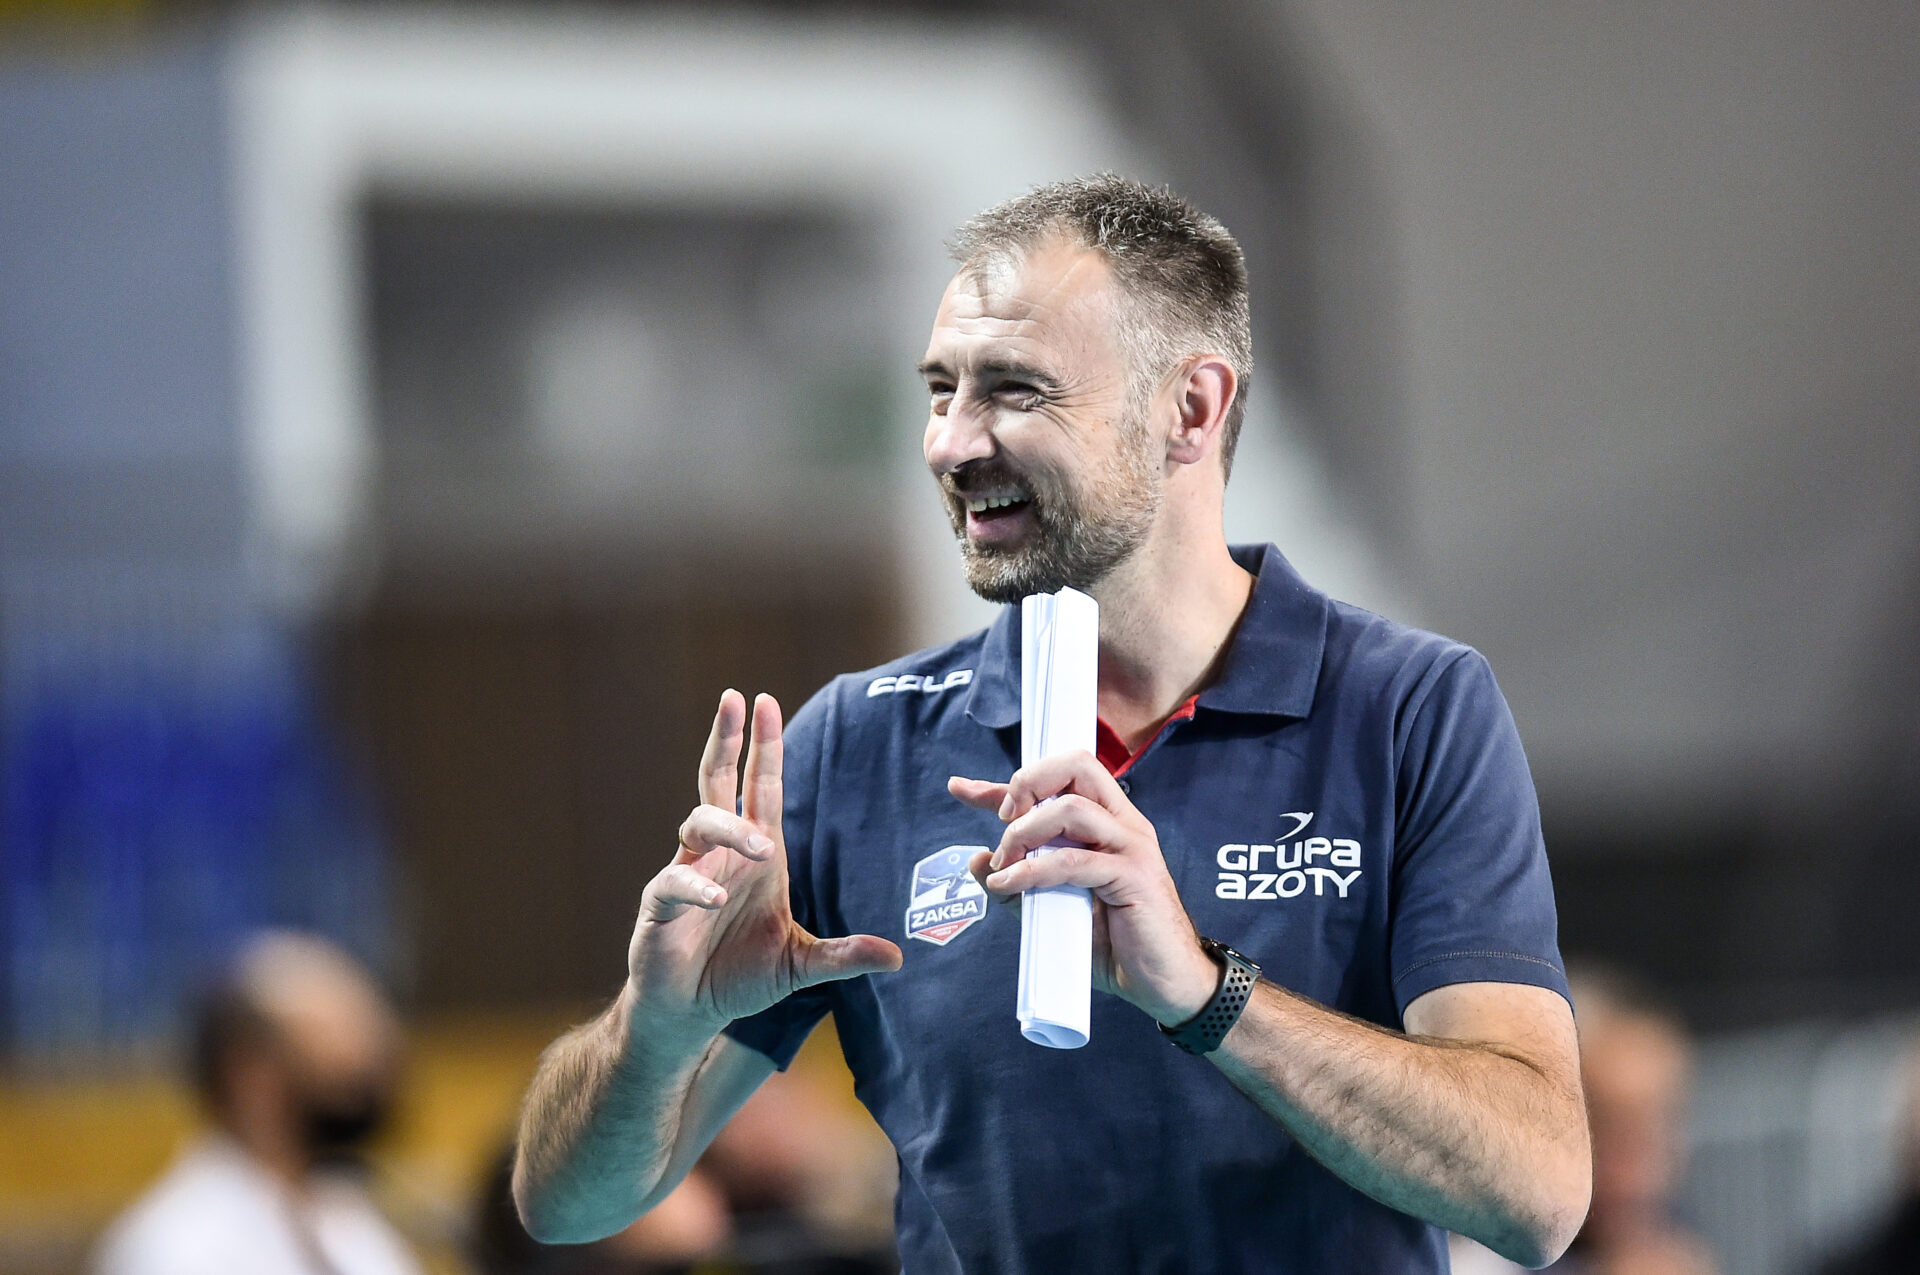 Grupa Azoty ZAKSA Kędzierzyn-Koźle vs Trefl Gdańsk fotogaleria